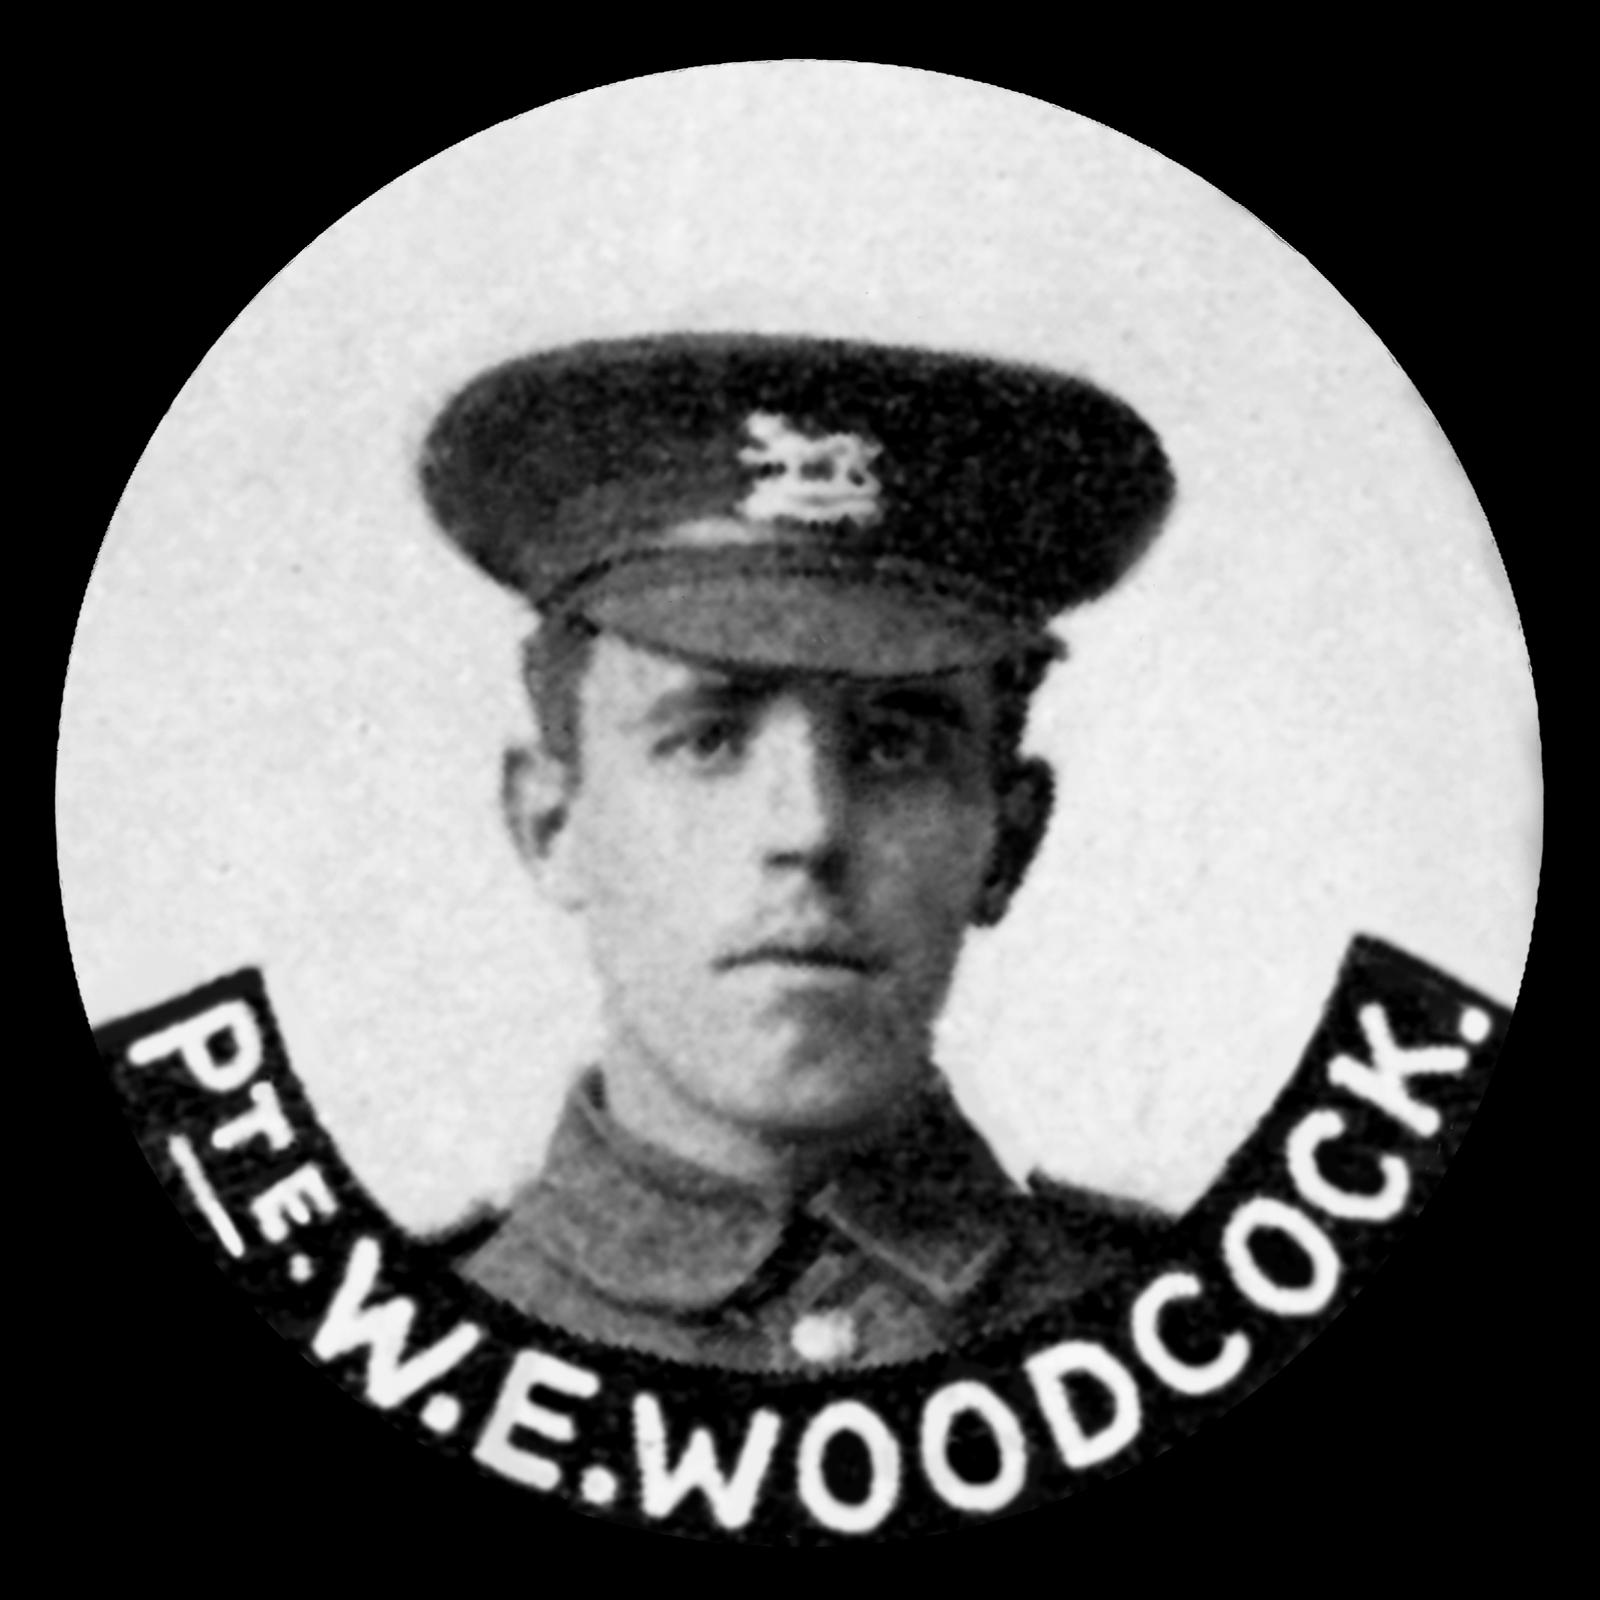 WOODCOCK William E